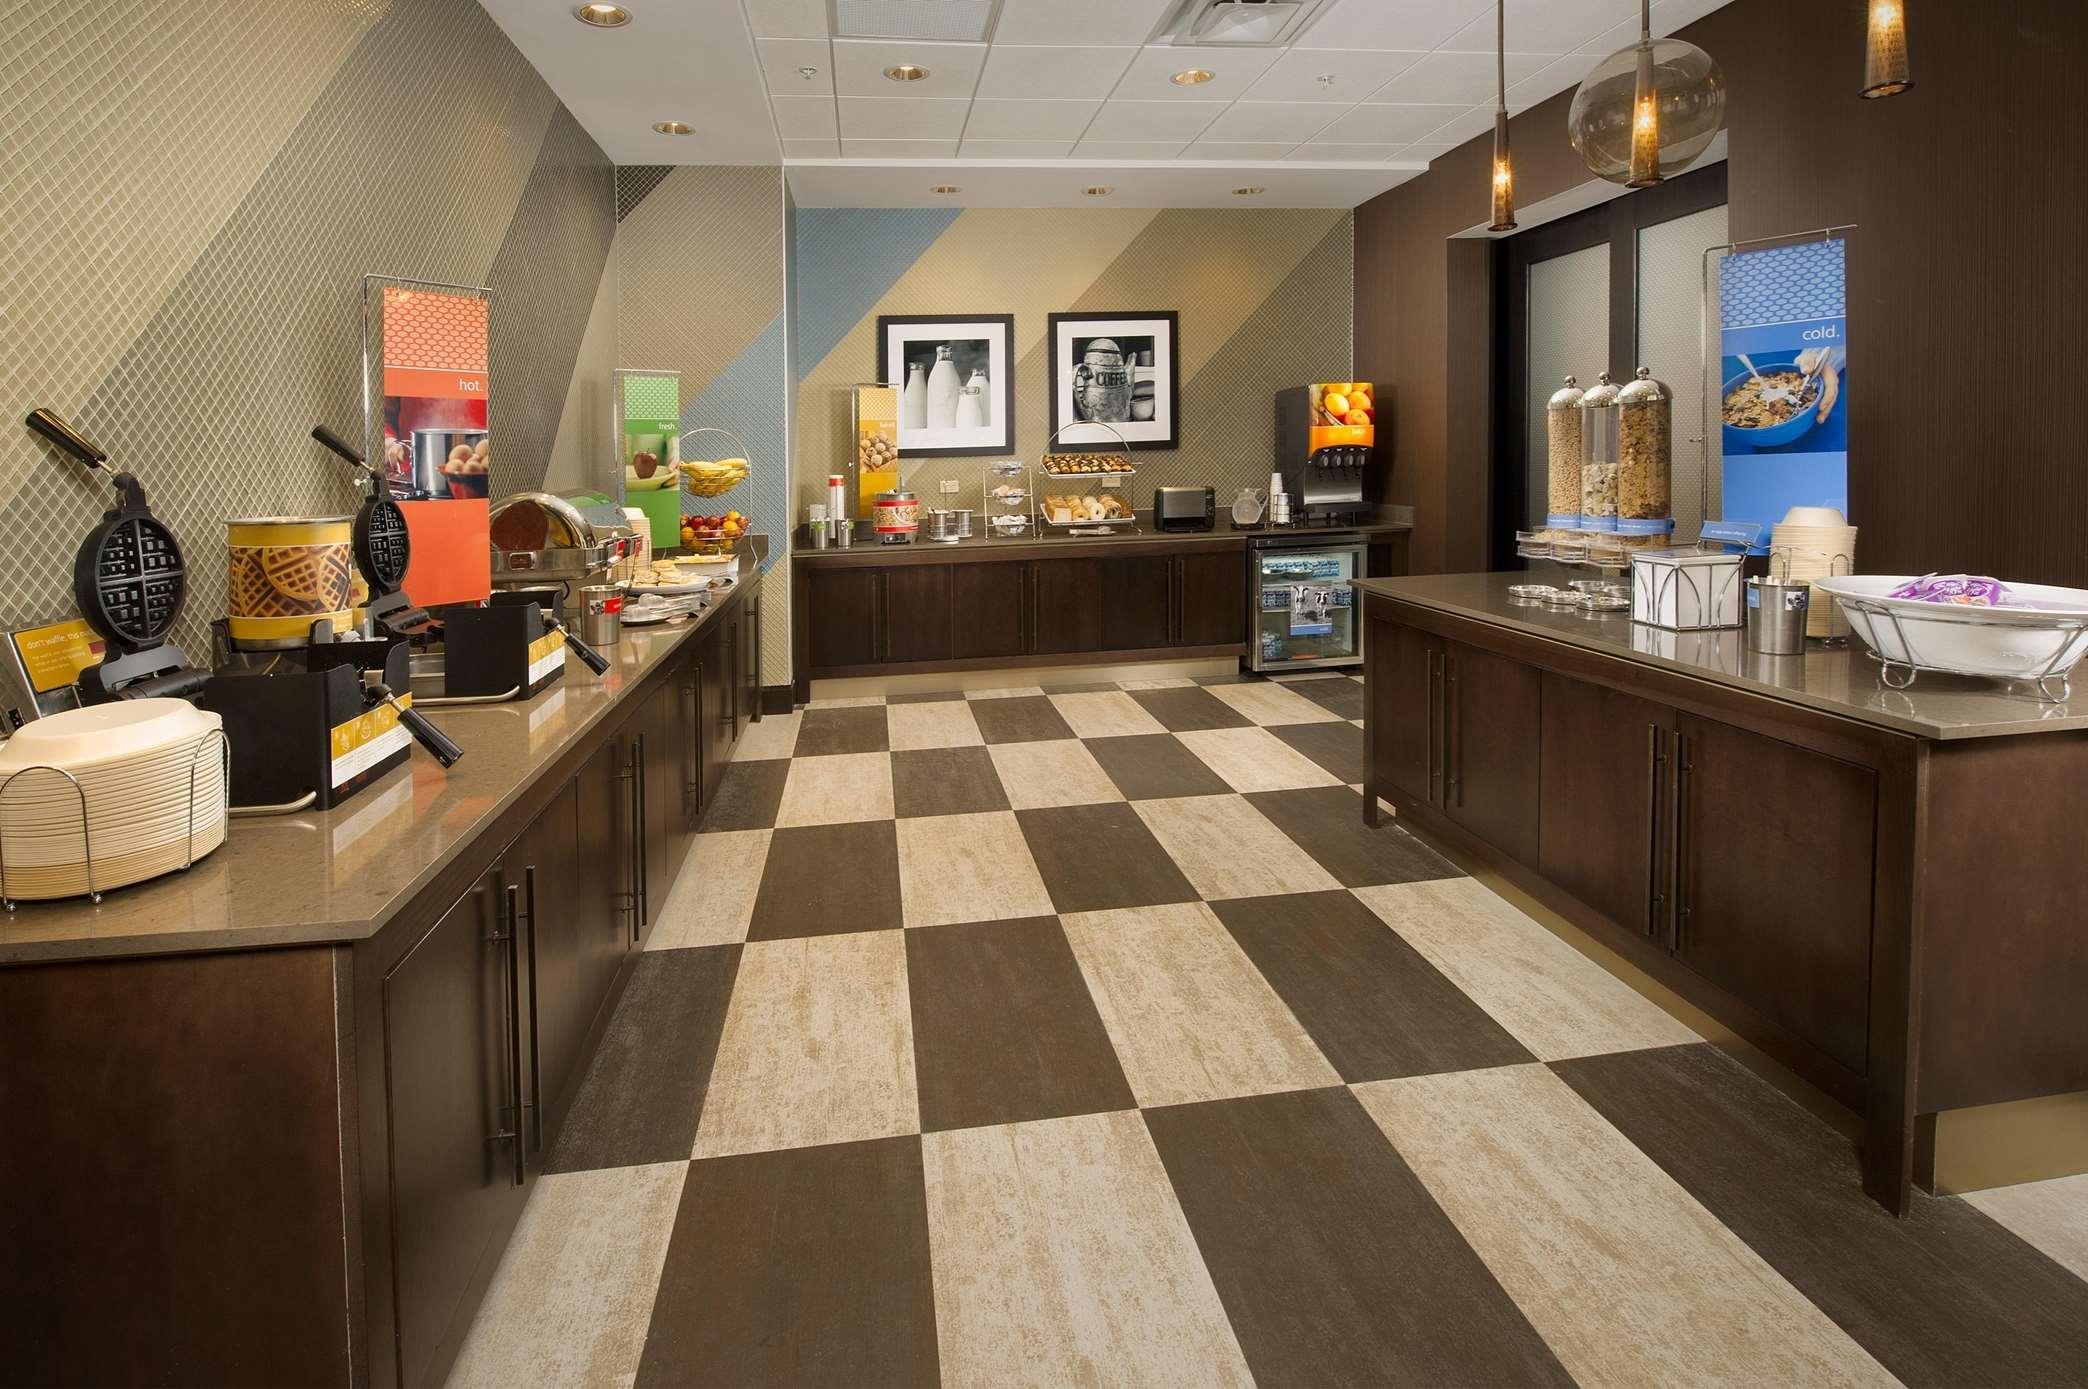 Hampton Inn & Suites San Antonio-Downtown/Market Square image 7